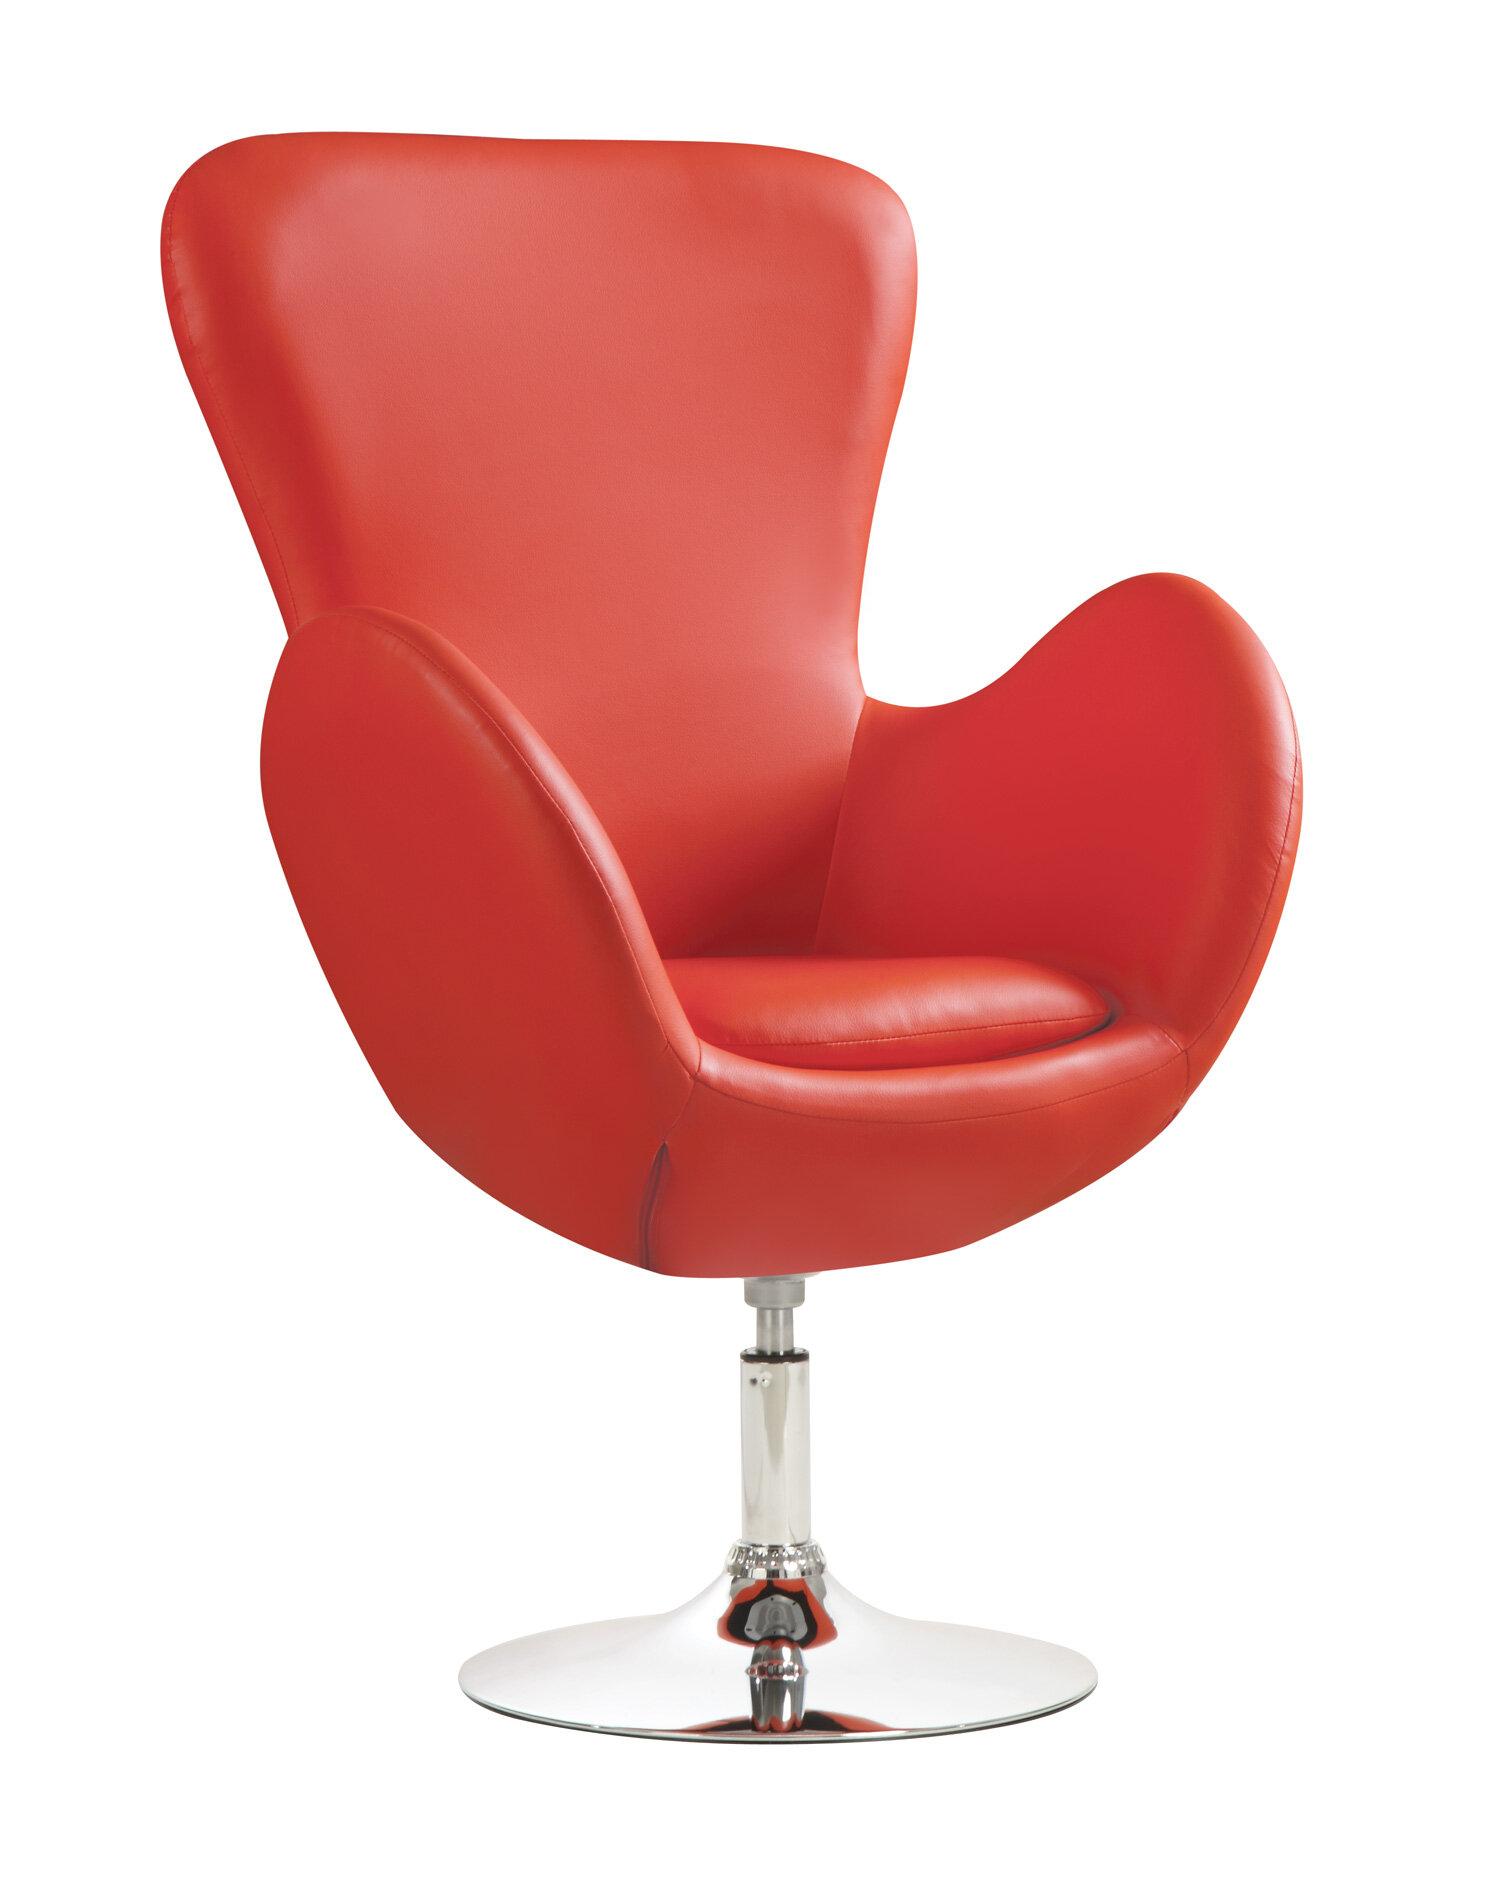 Wildon Home ® Swivel Lounge Chair U0026 Reviews | Wayfair